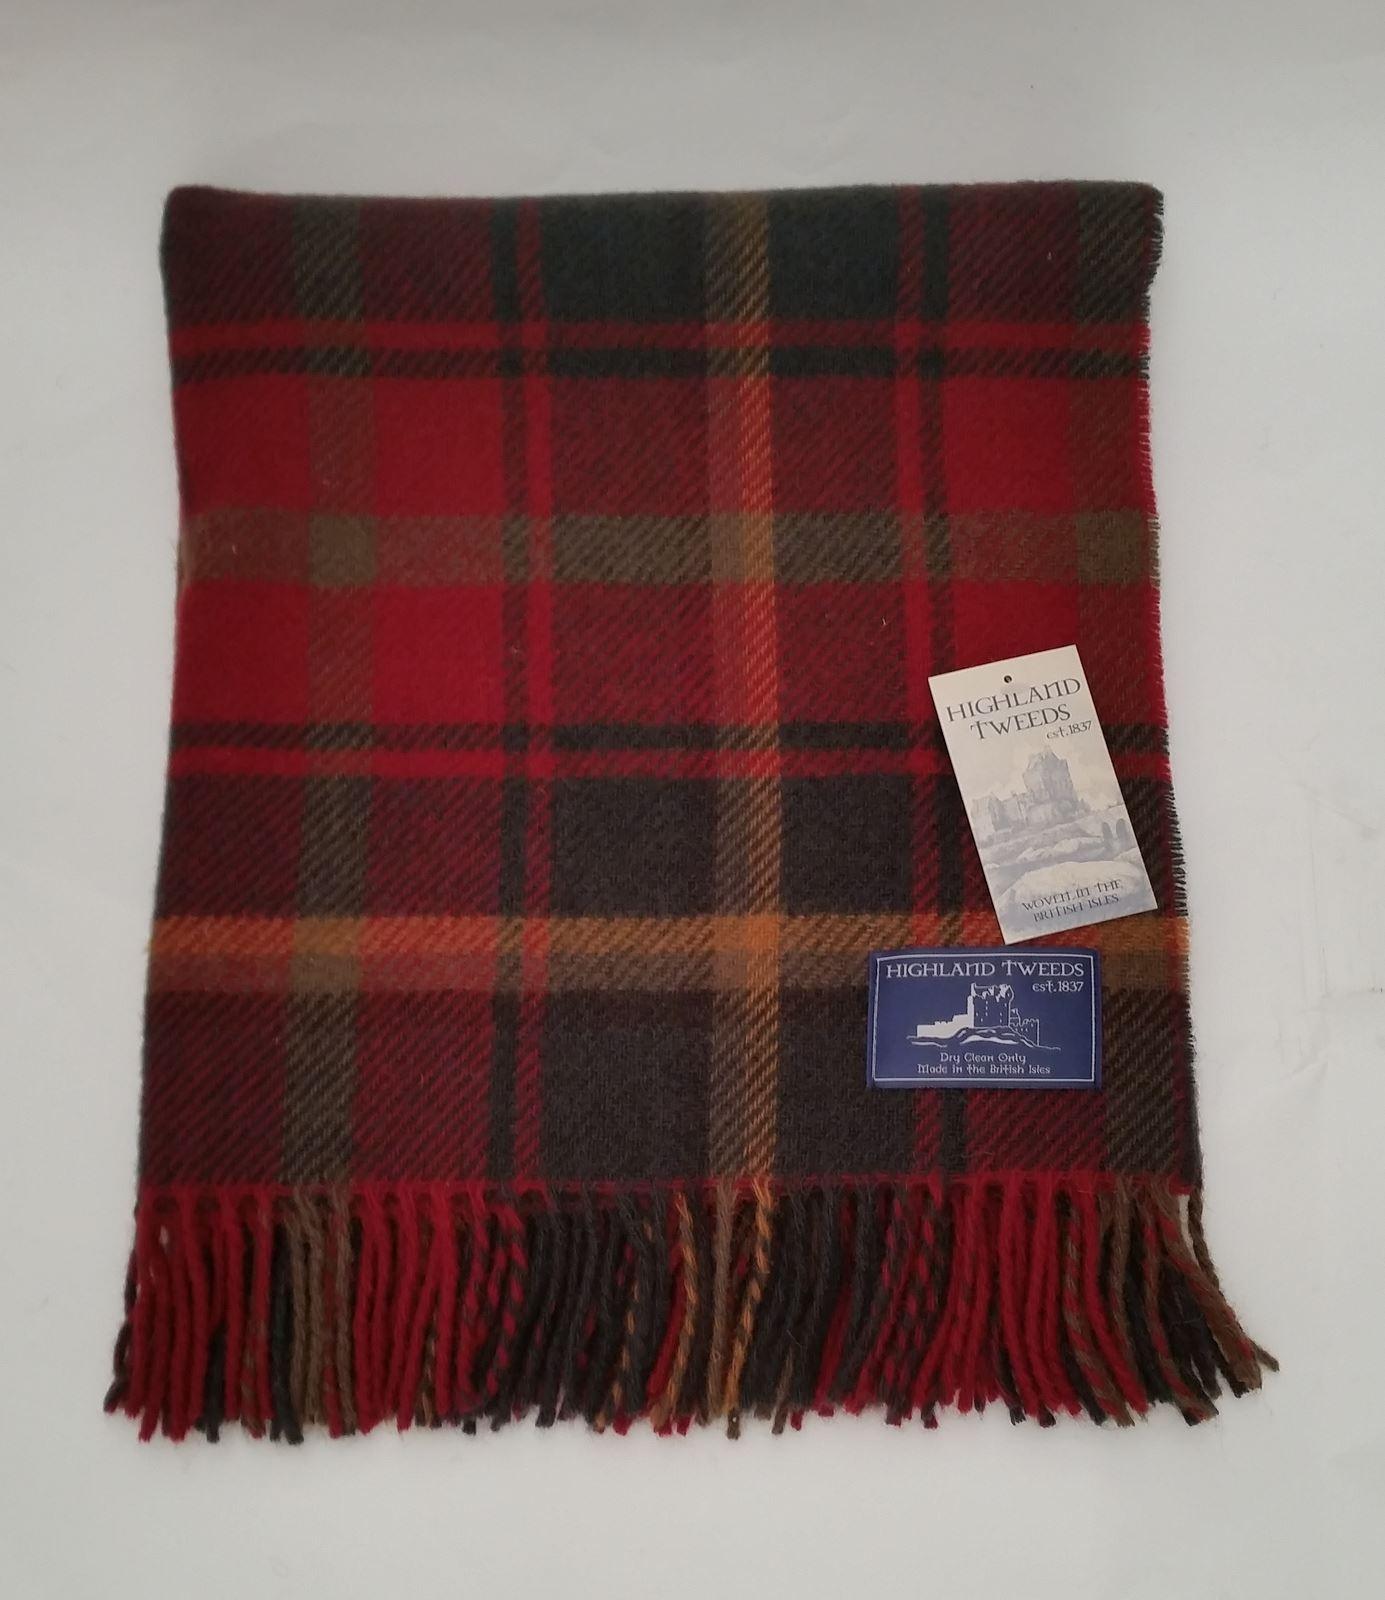 Bronte Tartan wool knee car rug British made small blanket throw Highland Tweeds